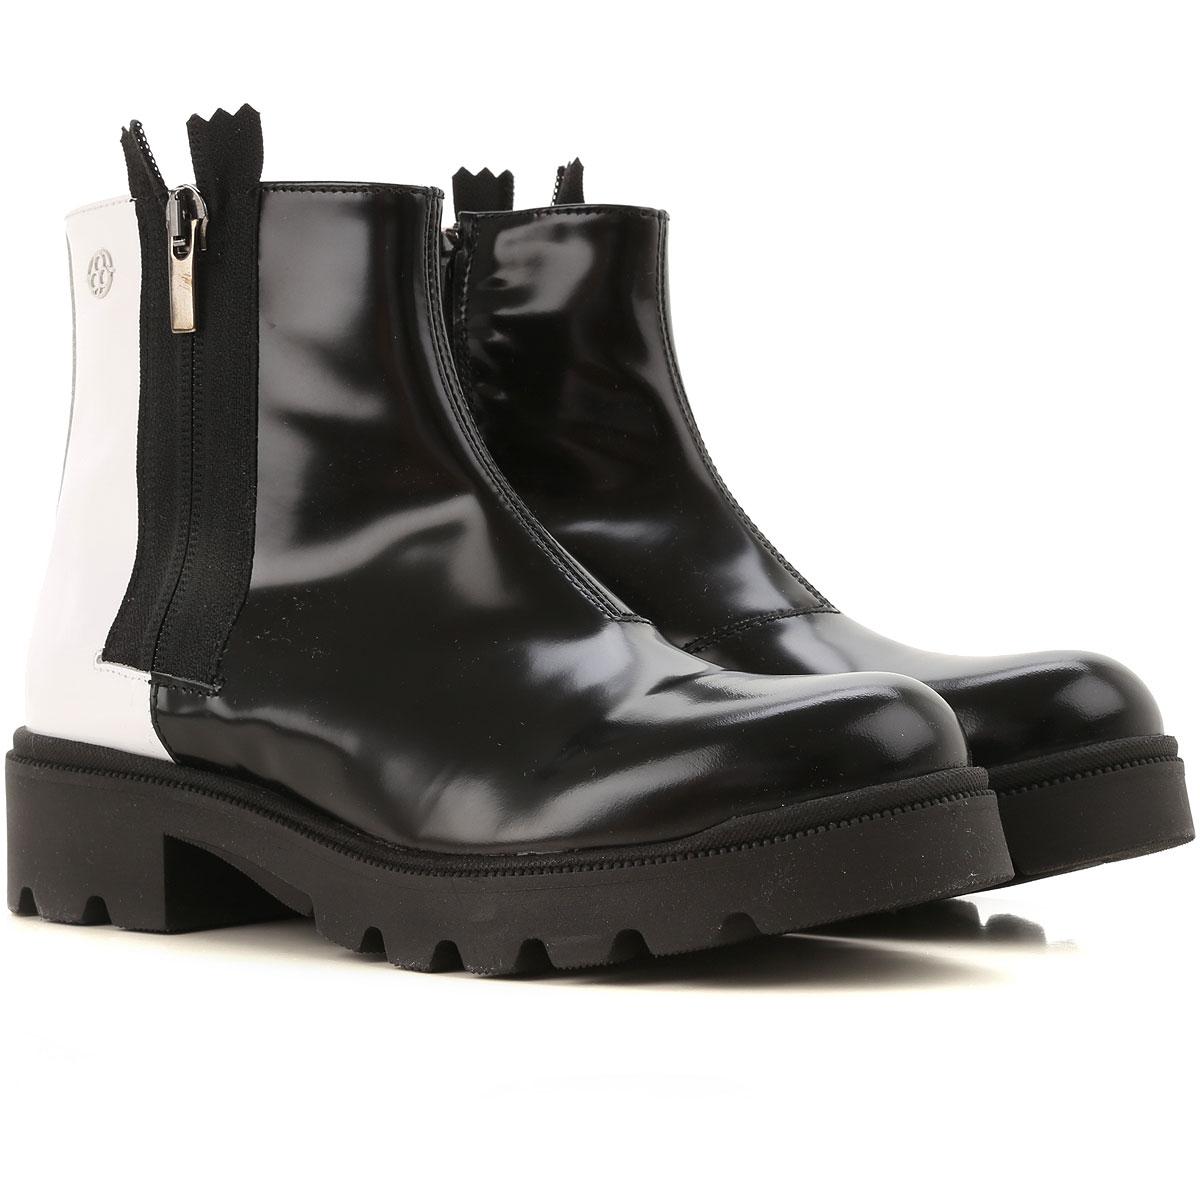 Florens Kids Shoes for Girls On Sale, Black, Rubber, 2019, 30 31 32 33 34 35 36 37 38